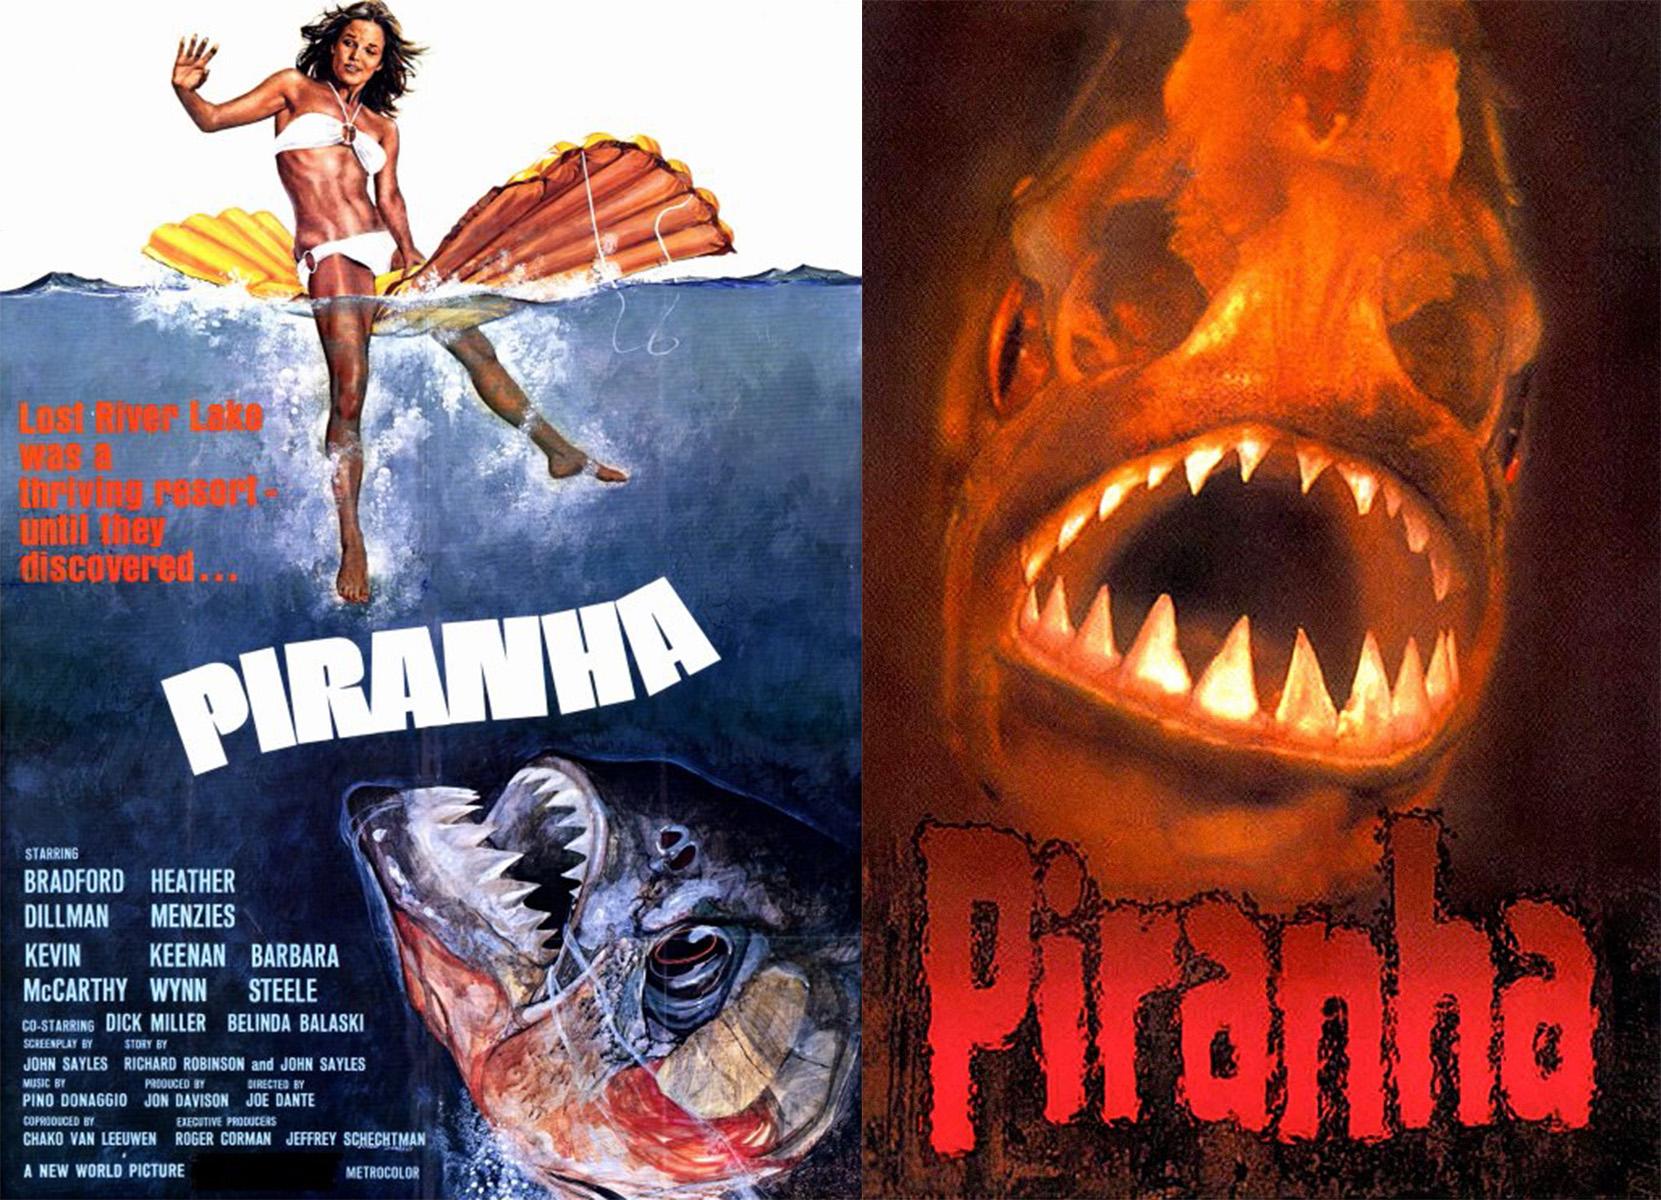 Piranha sbs.jpg